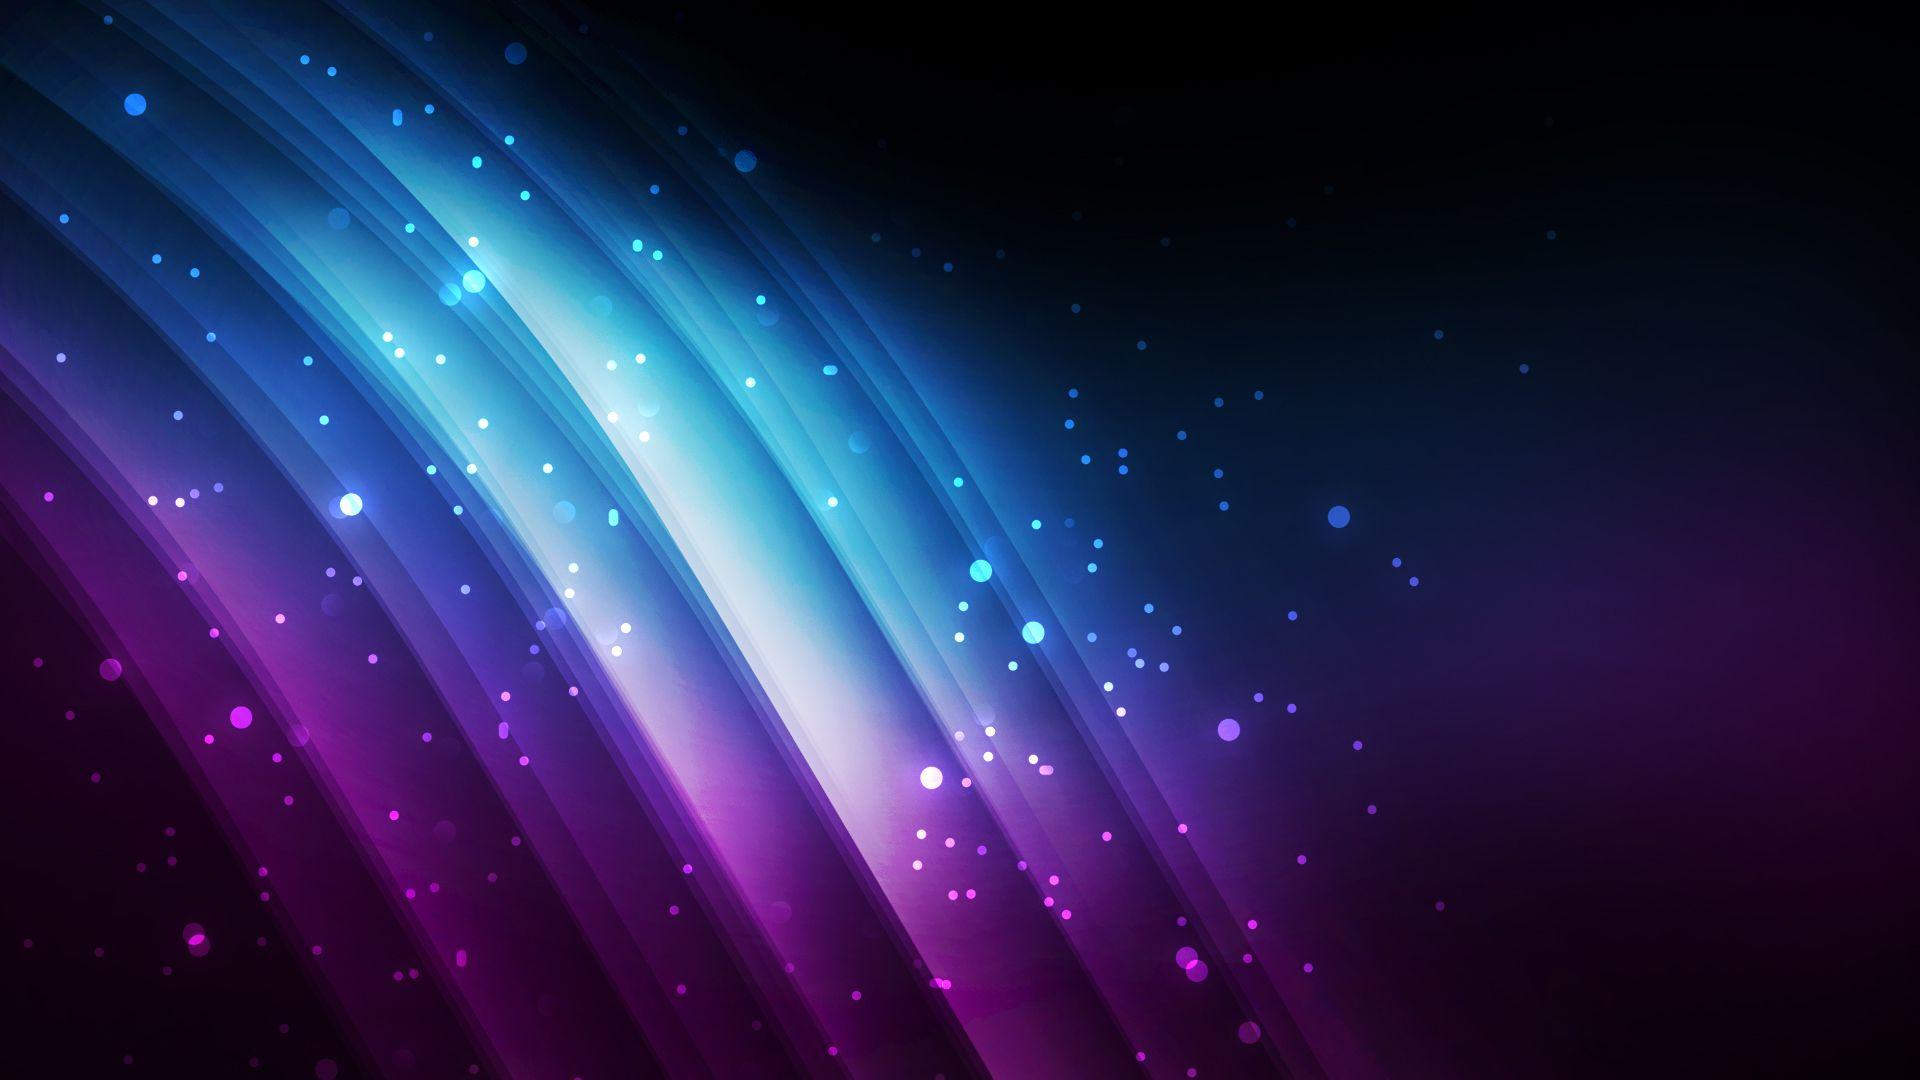 Shiny Cool HD Wallpaper